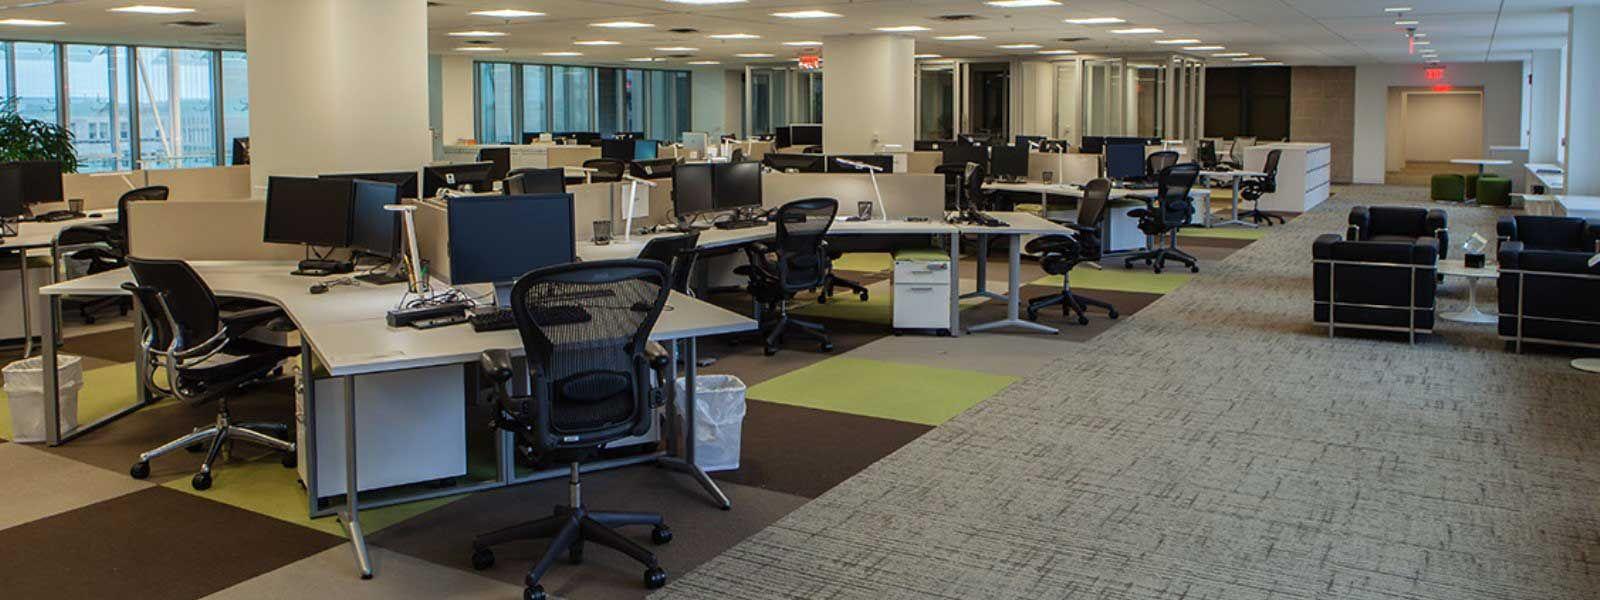 open floor office. Making Room For Innovation: Open-Plan Office Design Saves Money | Ven-American Open Floor T